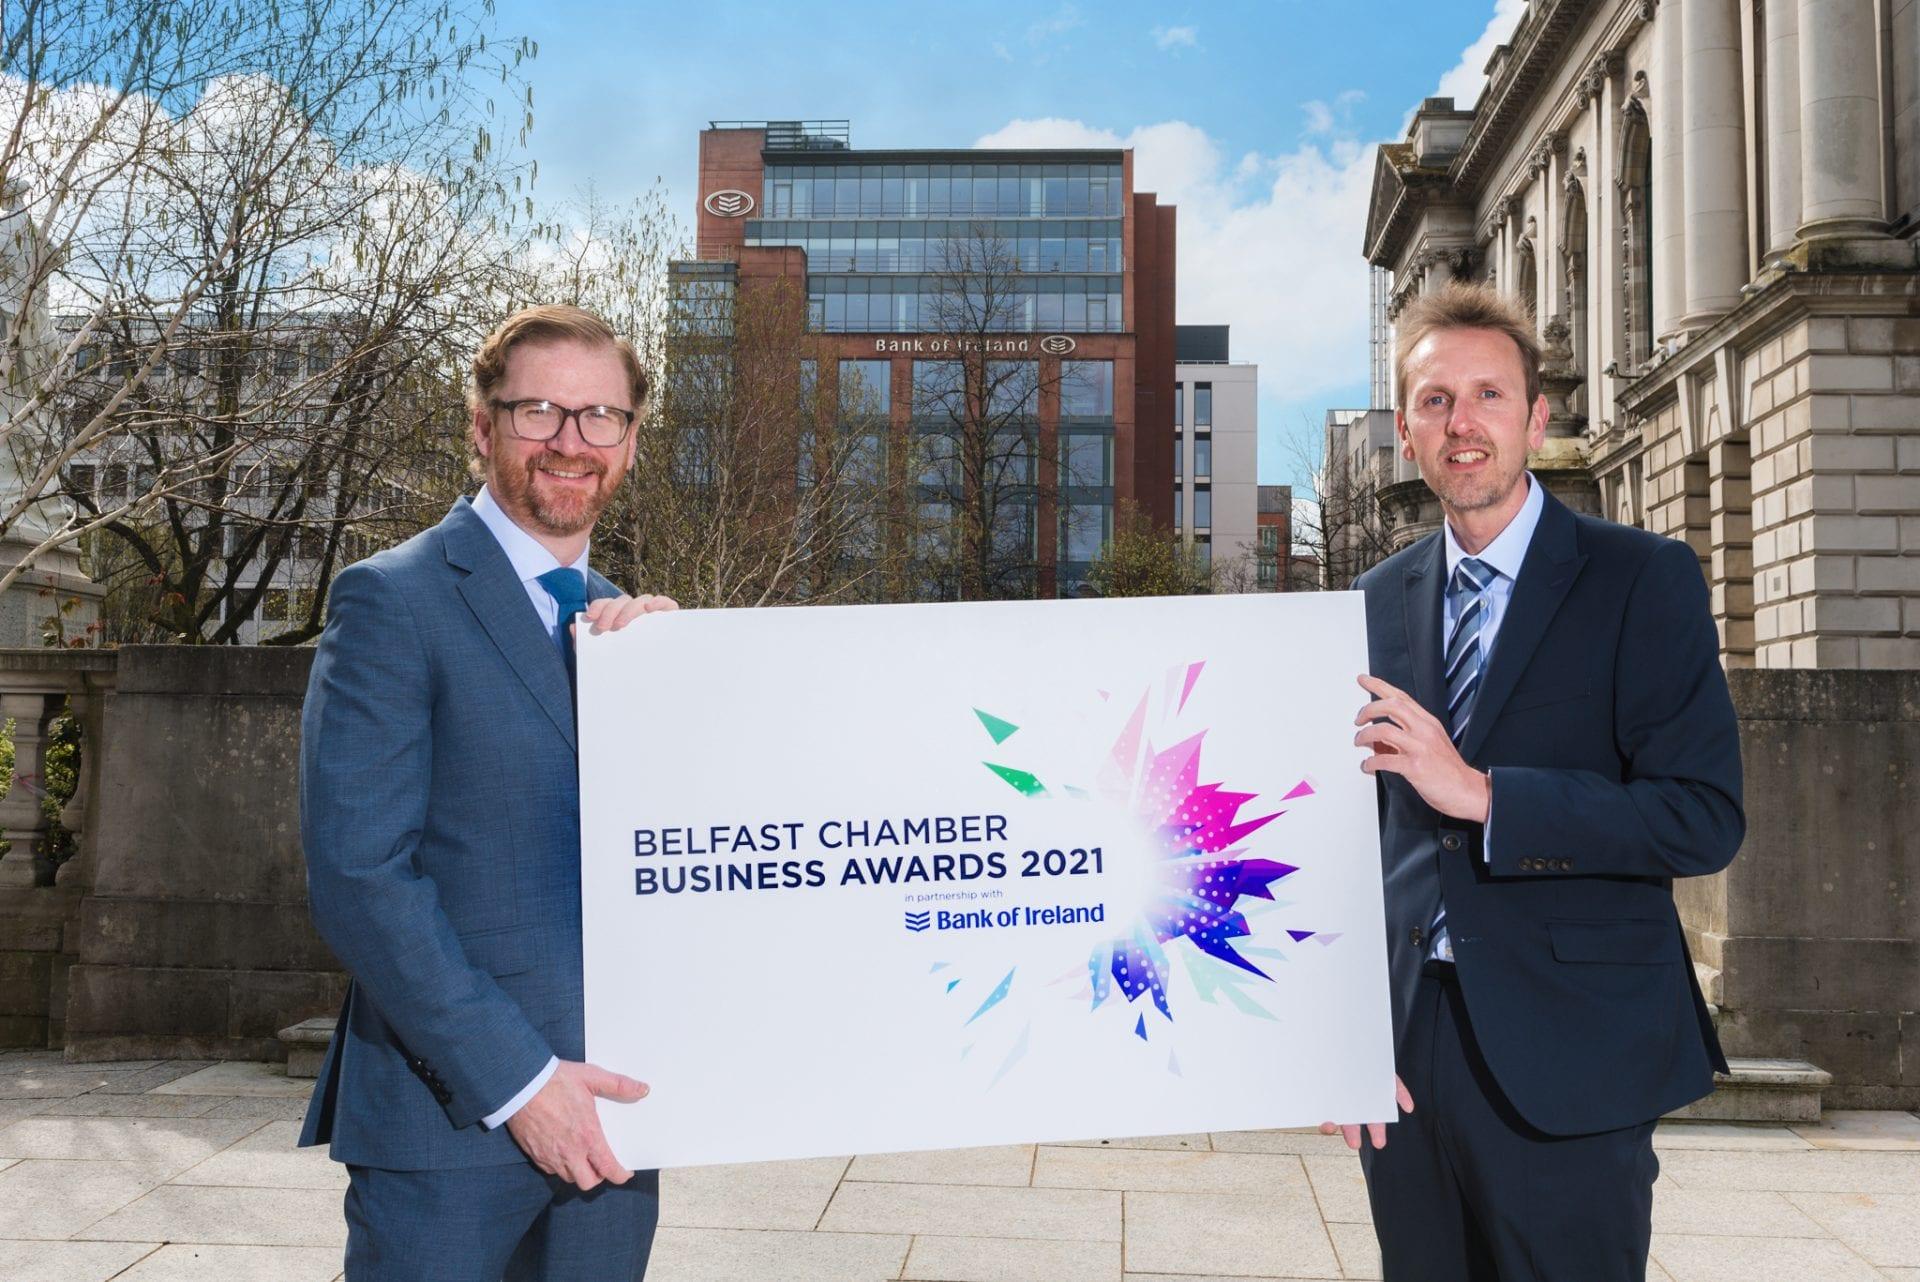 Belfast Chamber Business Awards 2021